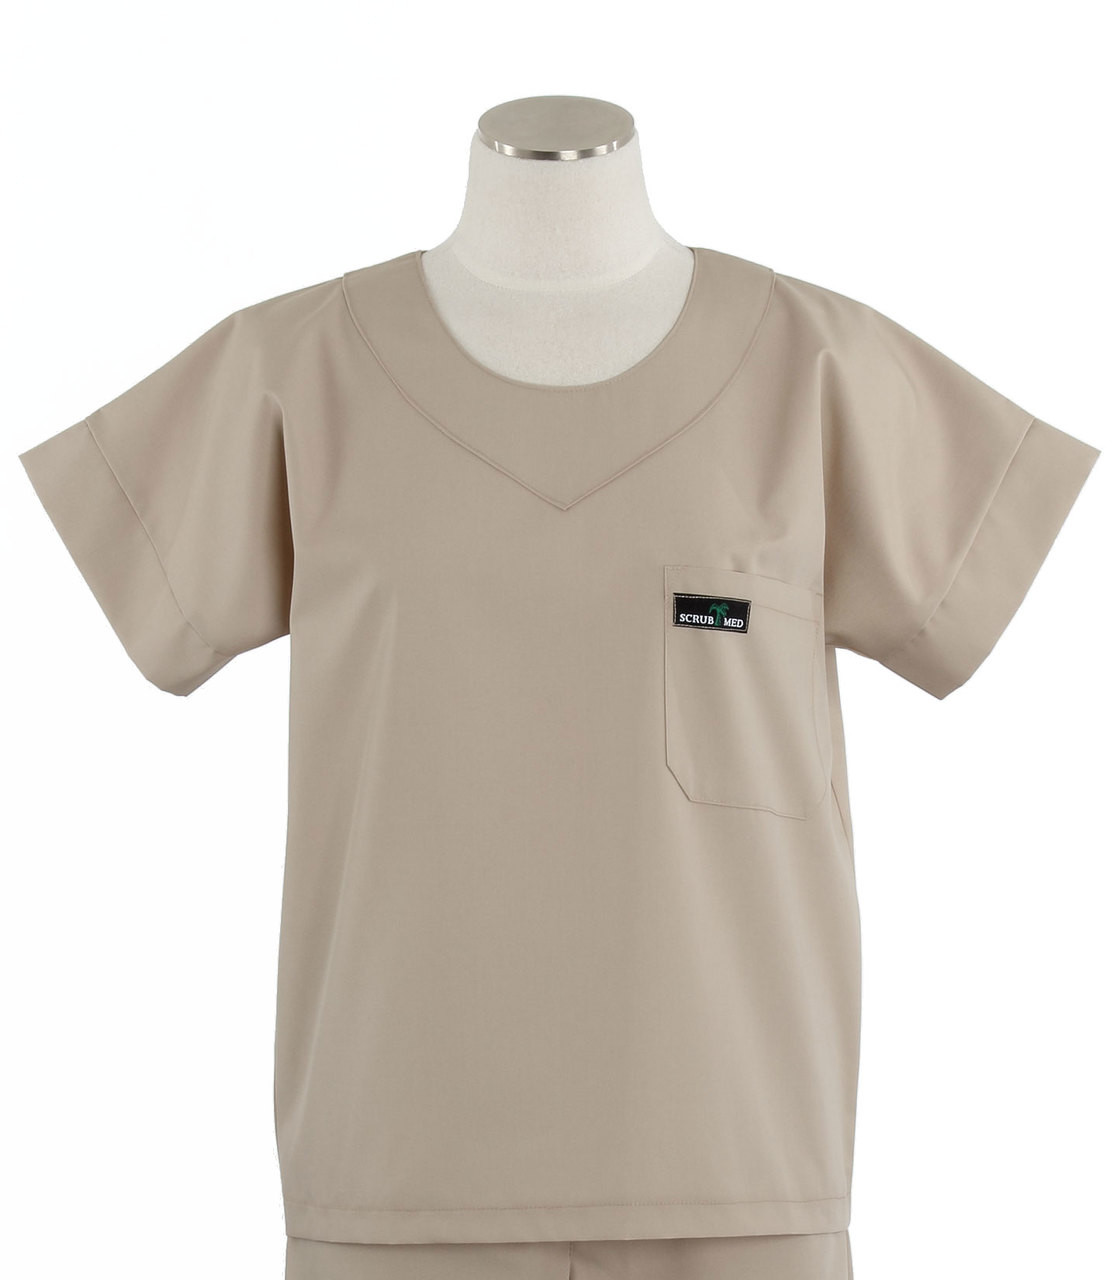 91d45a285bc Scrub Med Womens Solid Scrub Top Khaki - Scrub Med